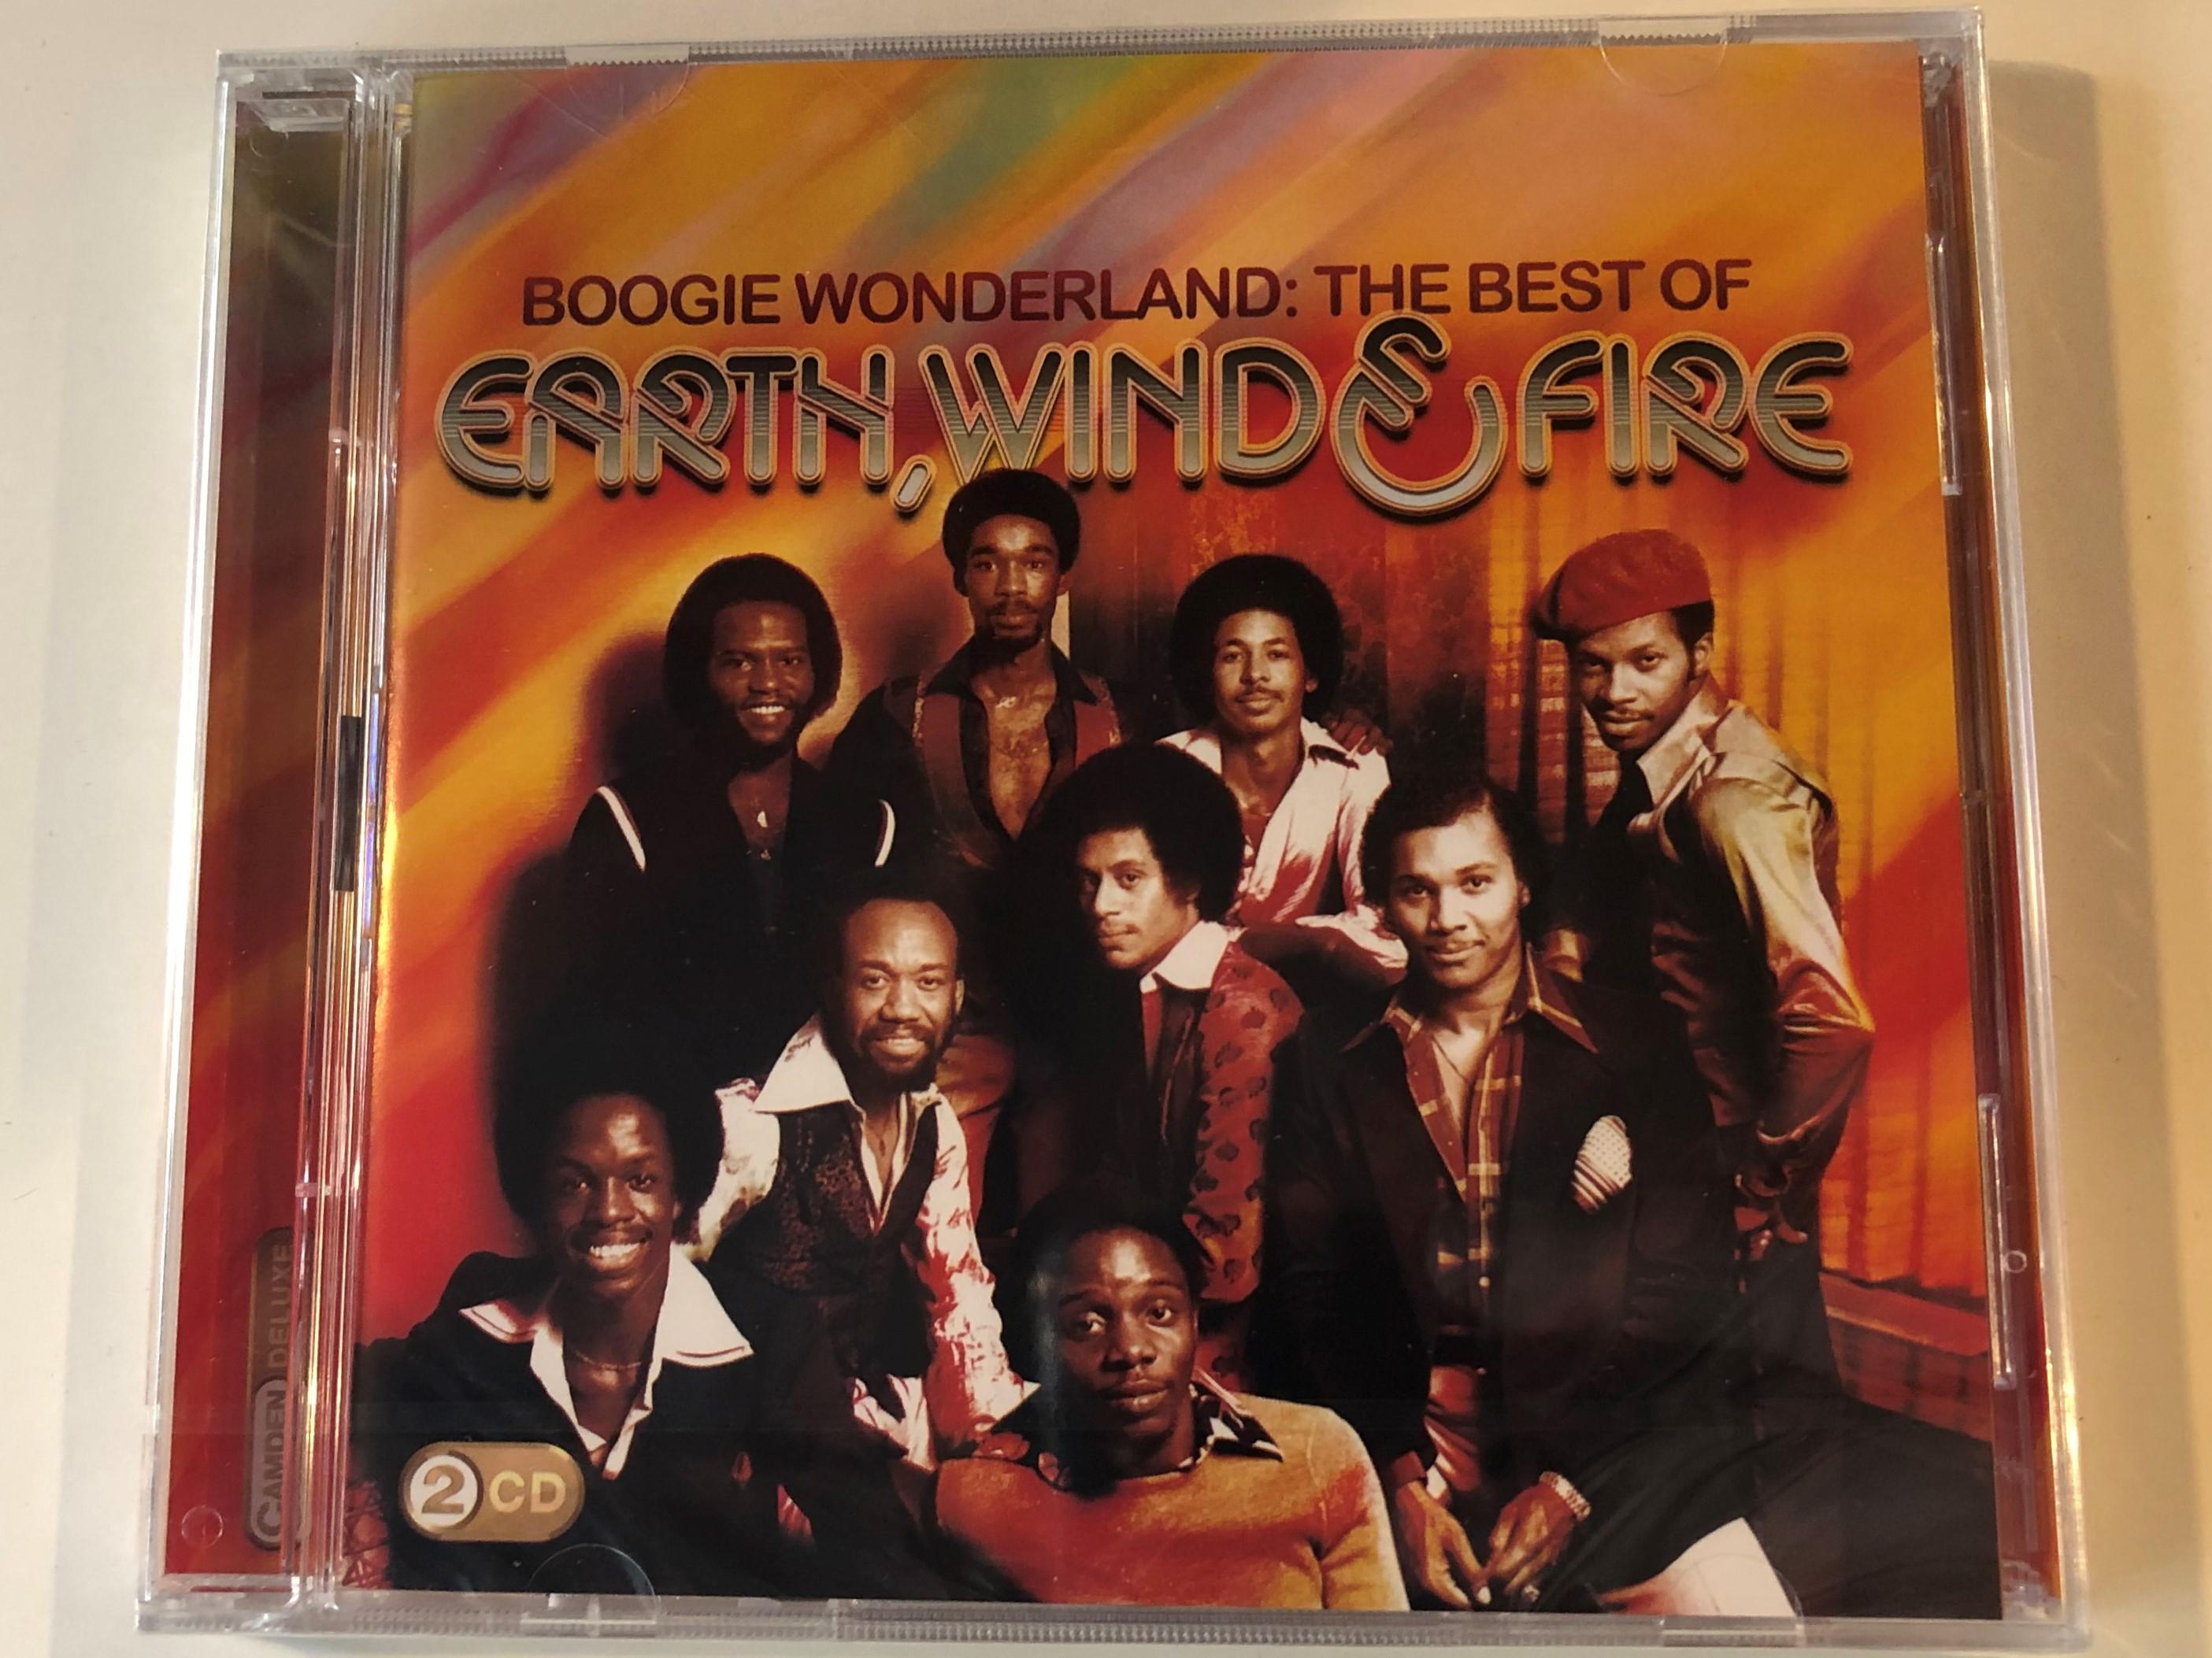 boogie-wonderland-the-best-of-earth-wind-fire-sony-music-2x-audio-cd-2010-88697671342-1-.jpg